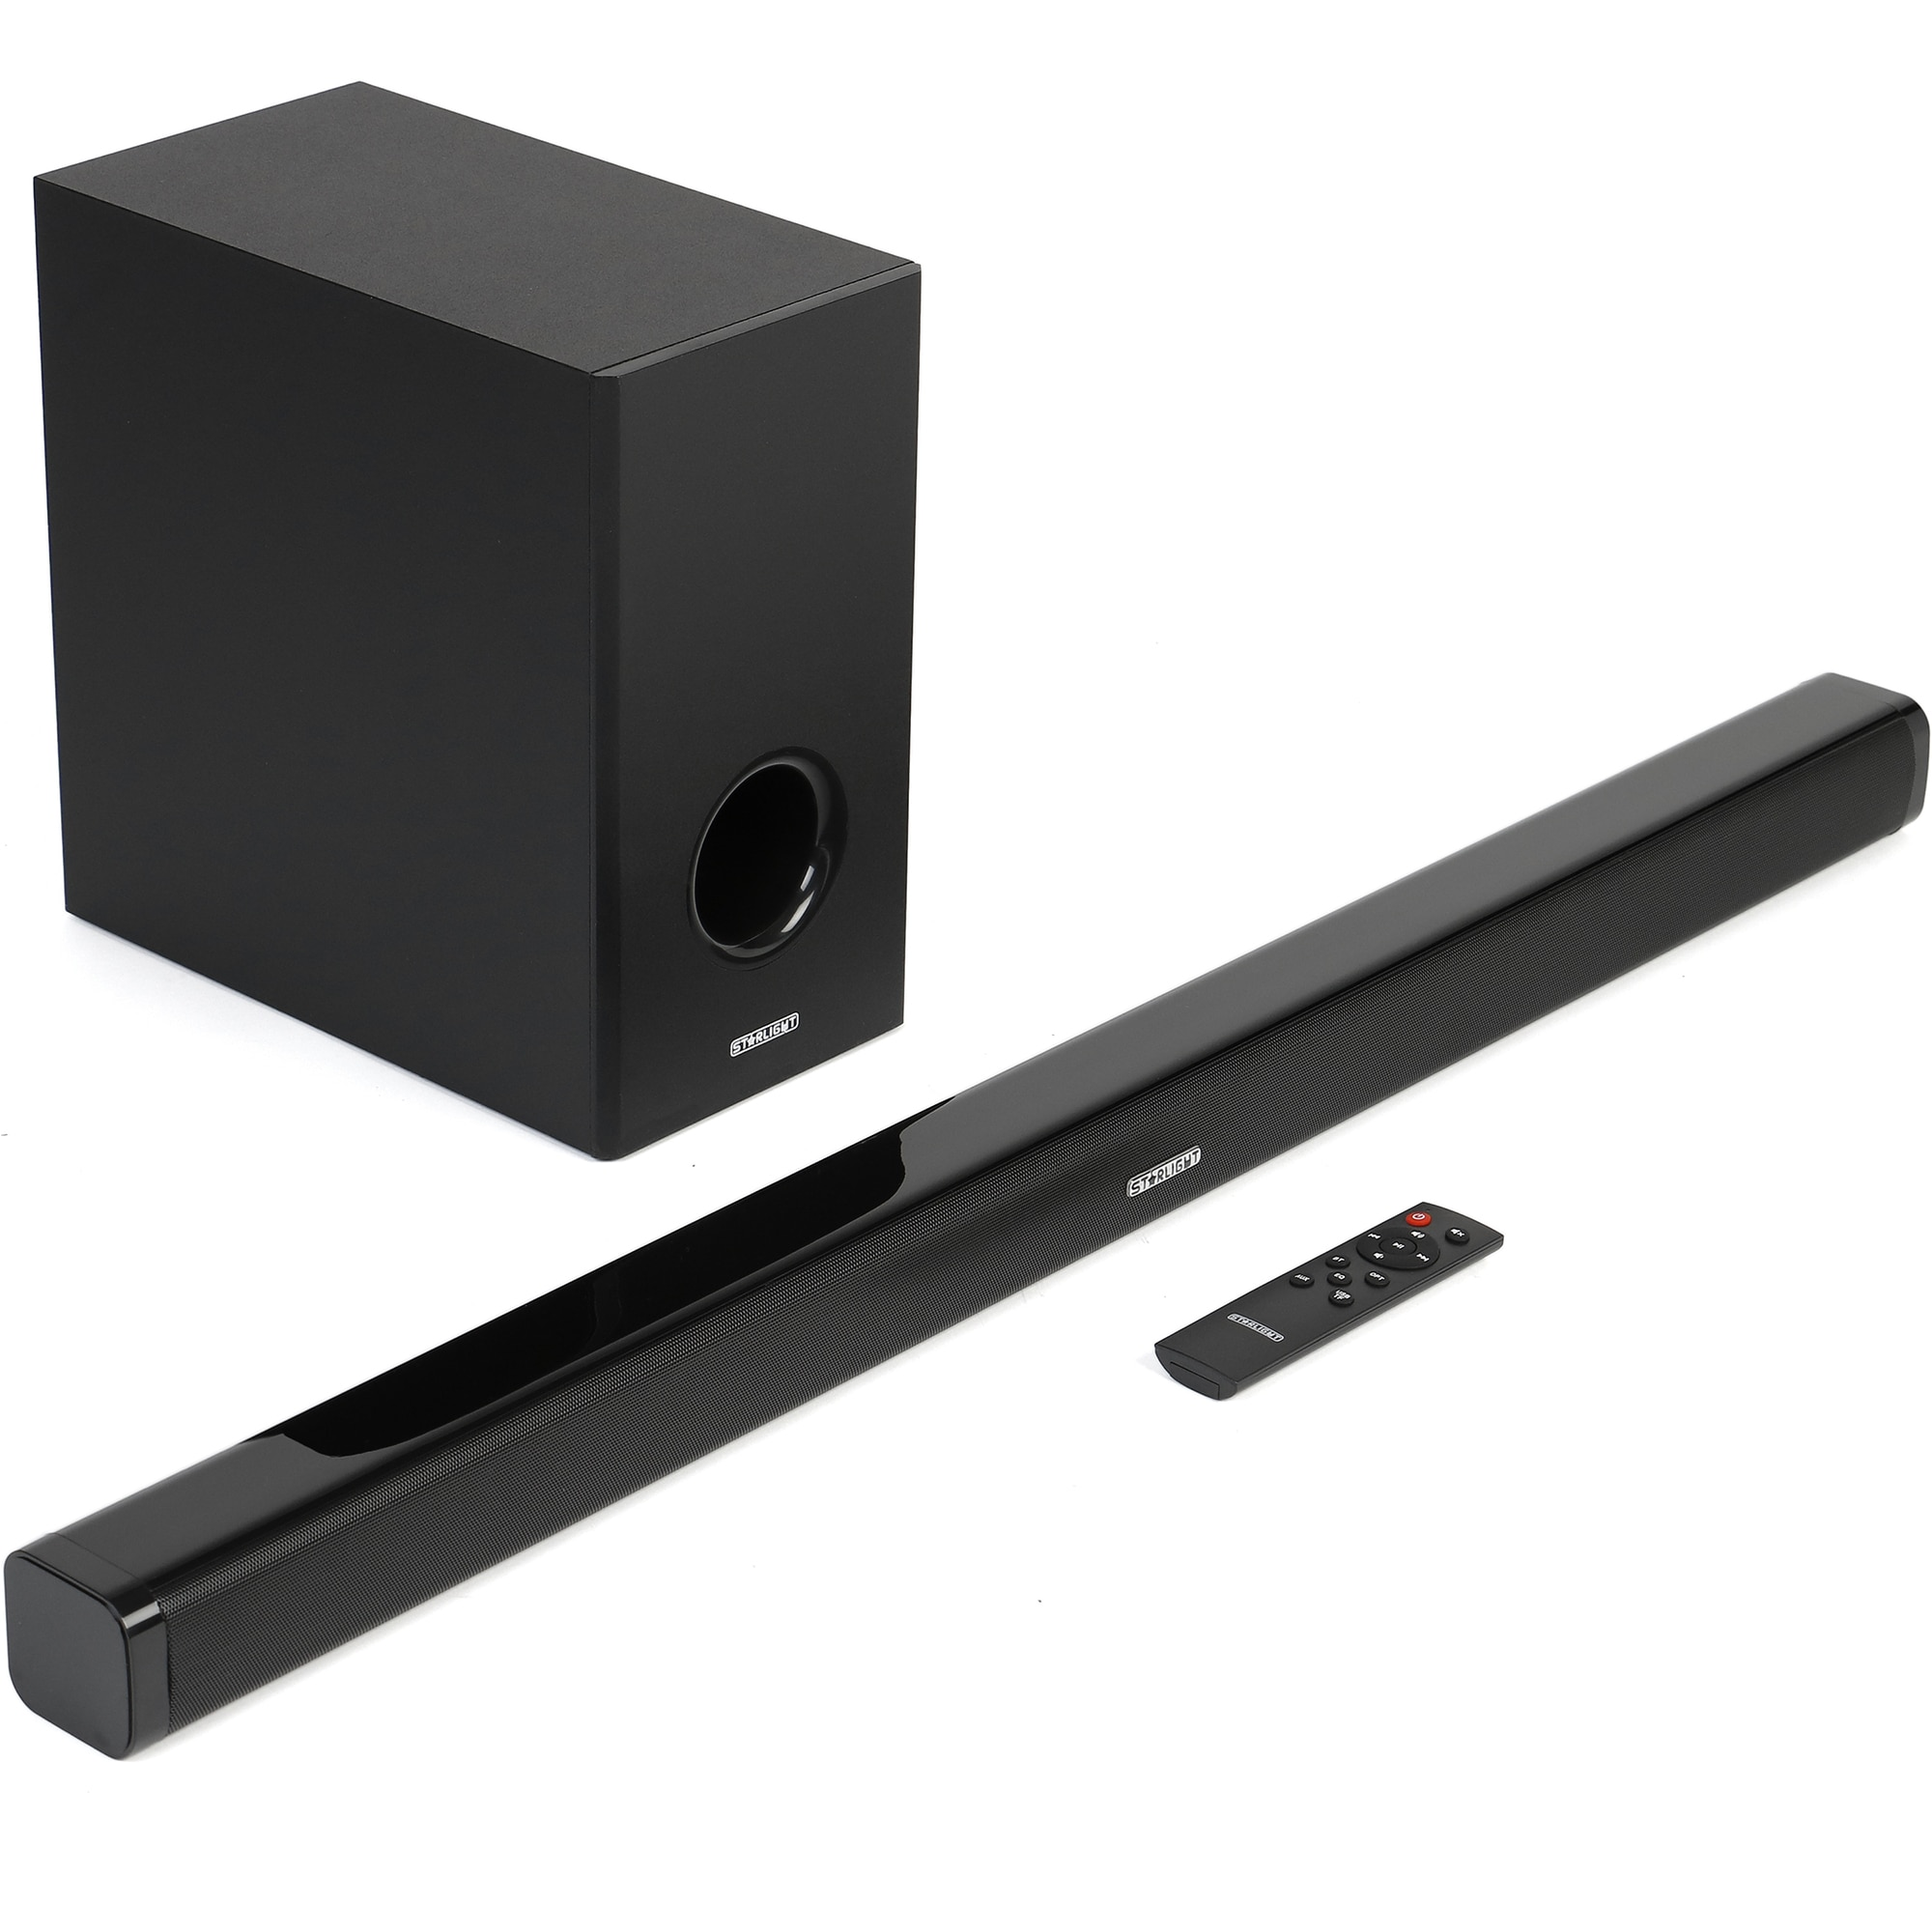 Fotografie Soundbar Star-Light SB105, 160W, 2.1, USB, Bluetooth, Soundbar, Negru